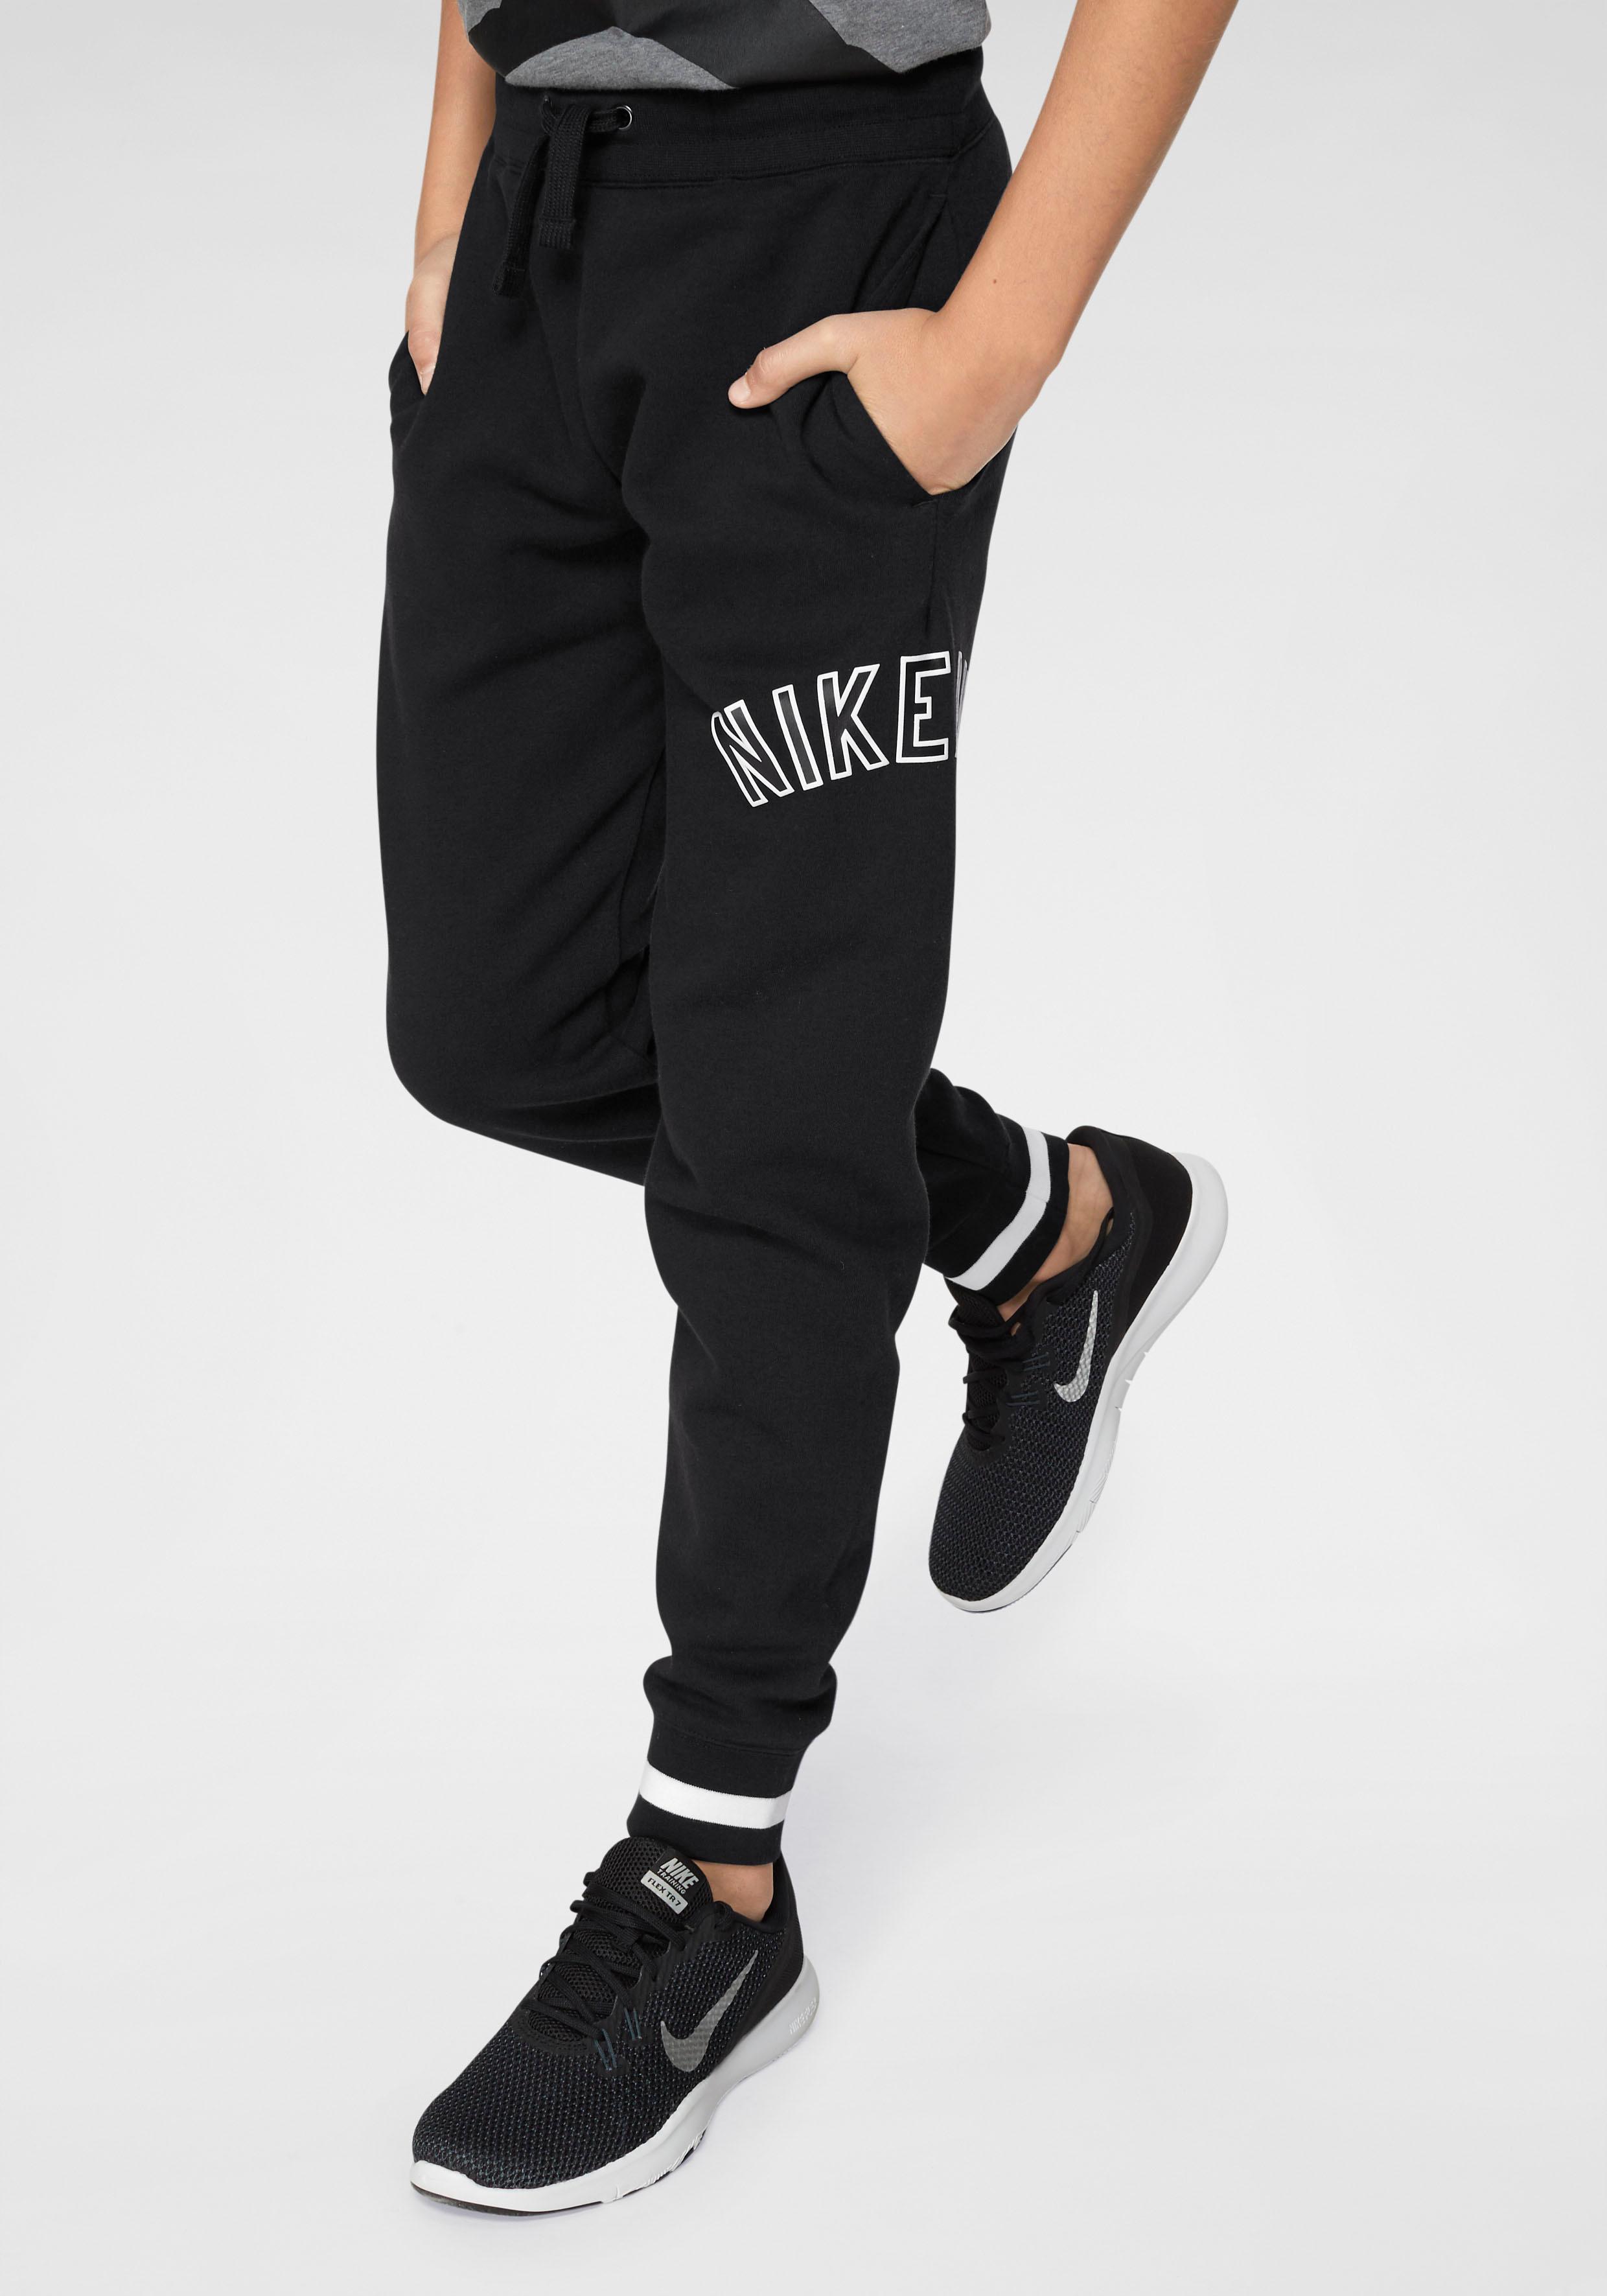 759e0d492bdec Nike Sportswear Jogginghose »BOYS NIKE AIR PANT« online kaufen